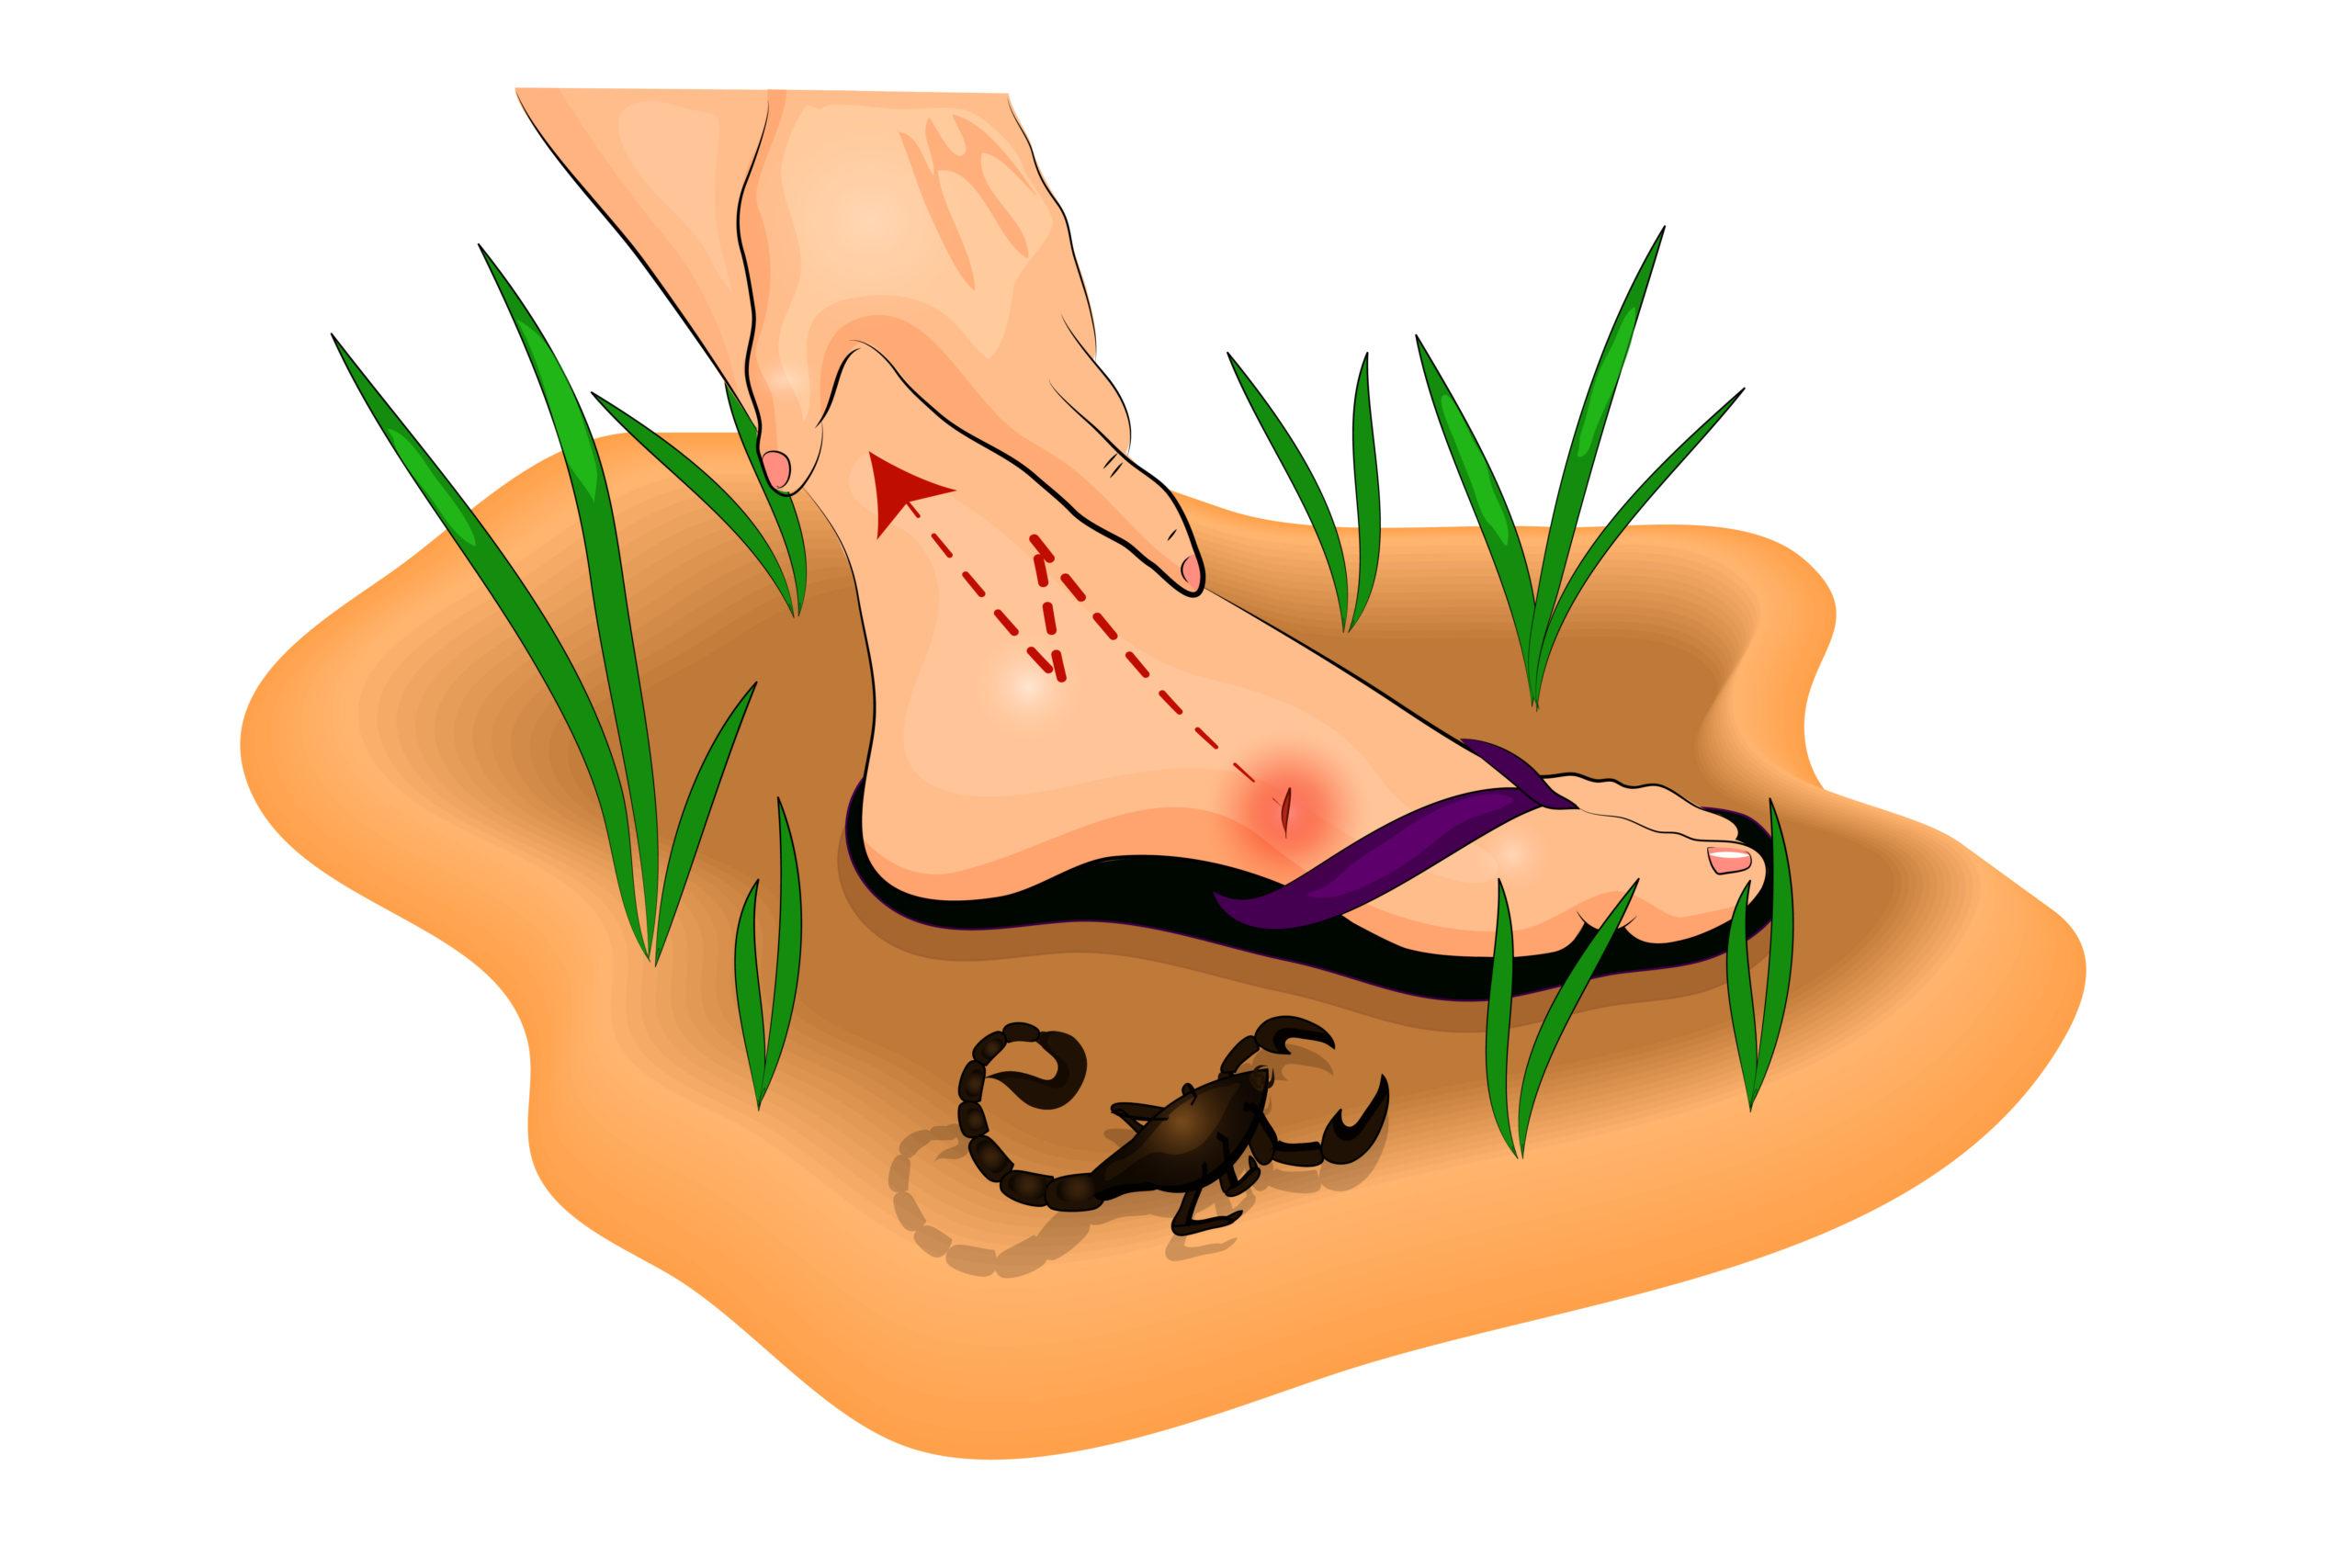 Punture di scorpioni velenosi